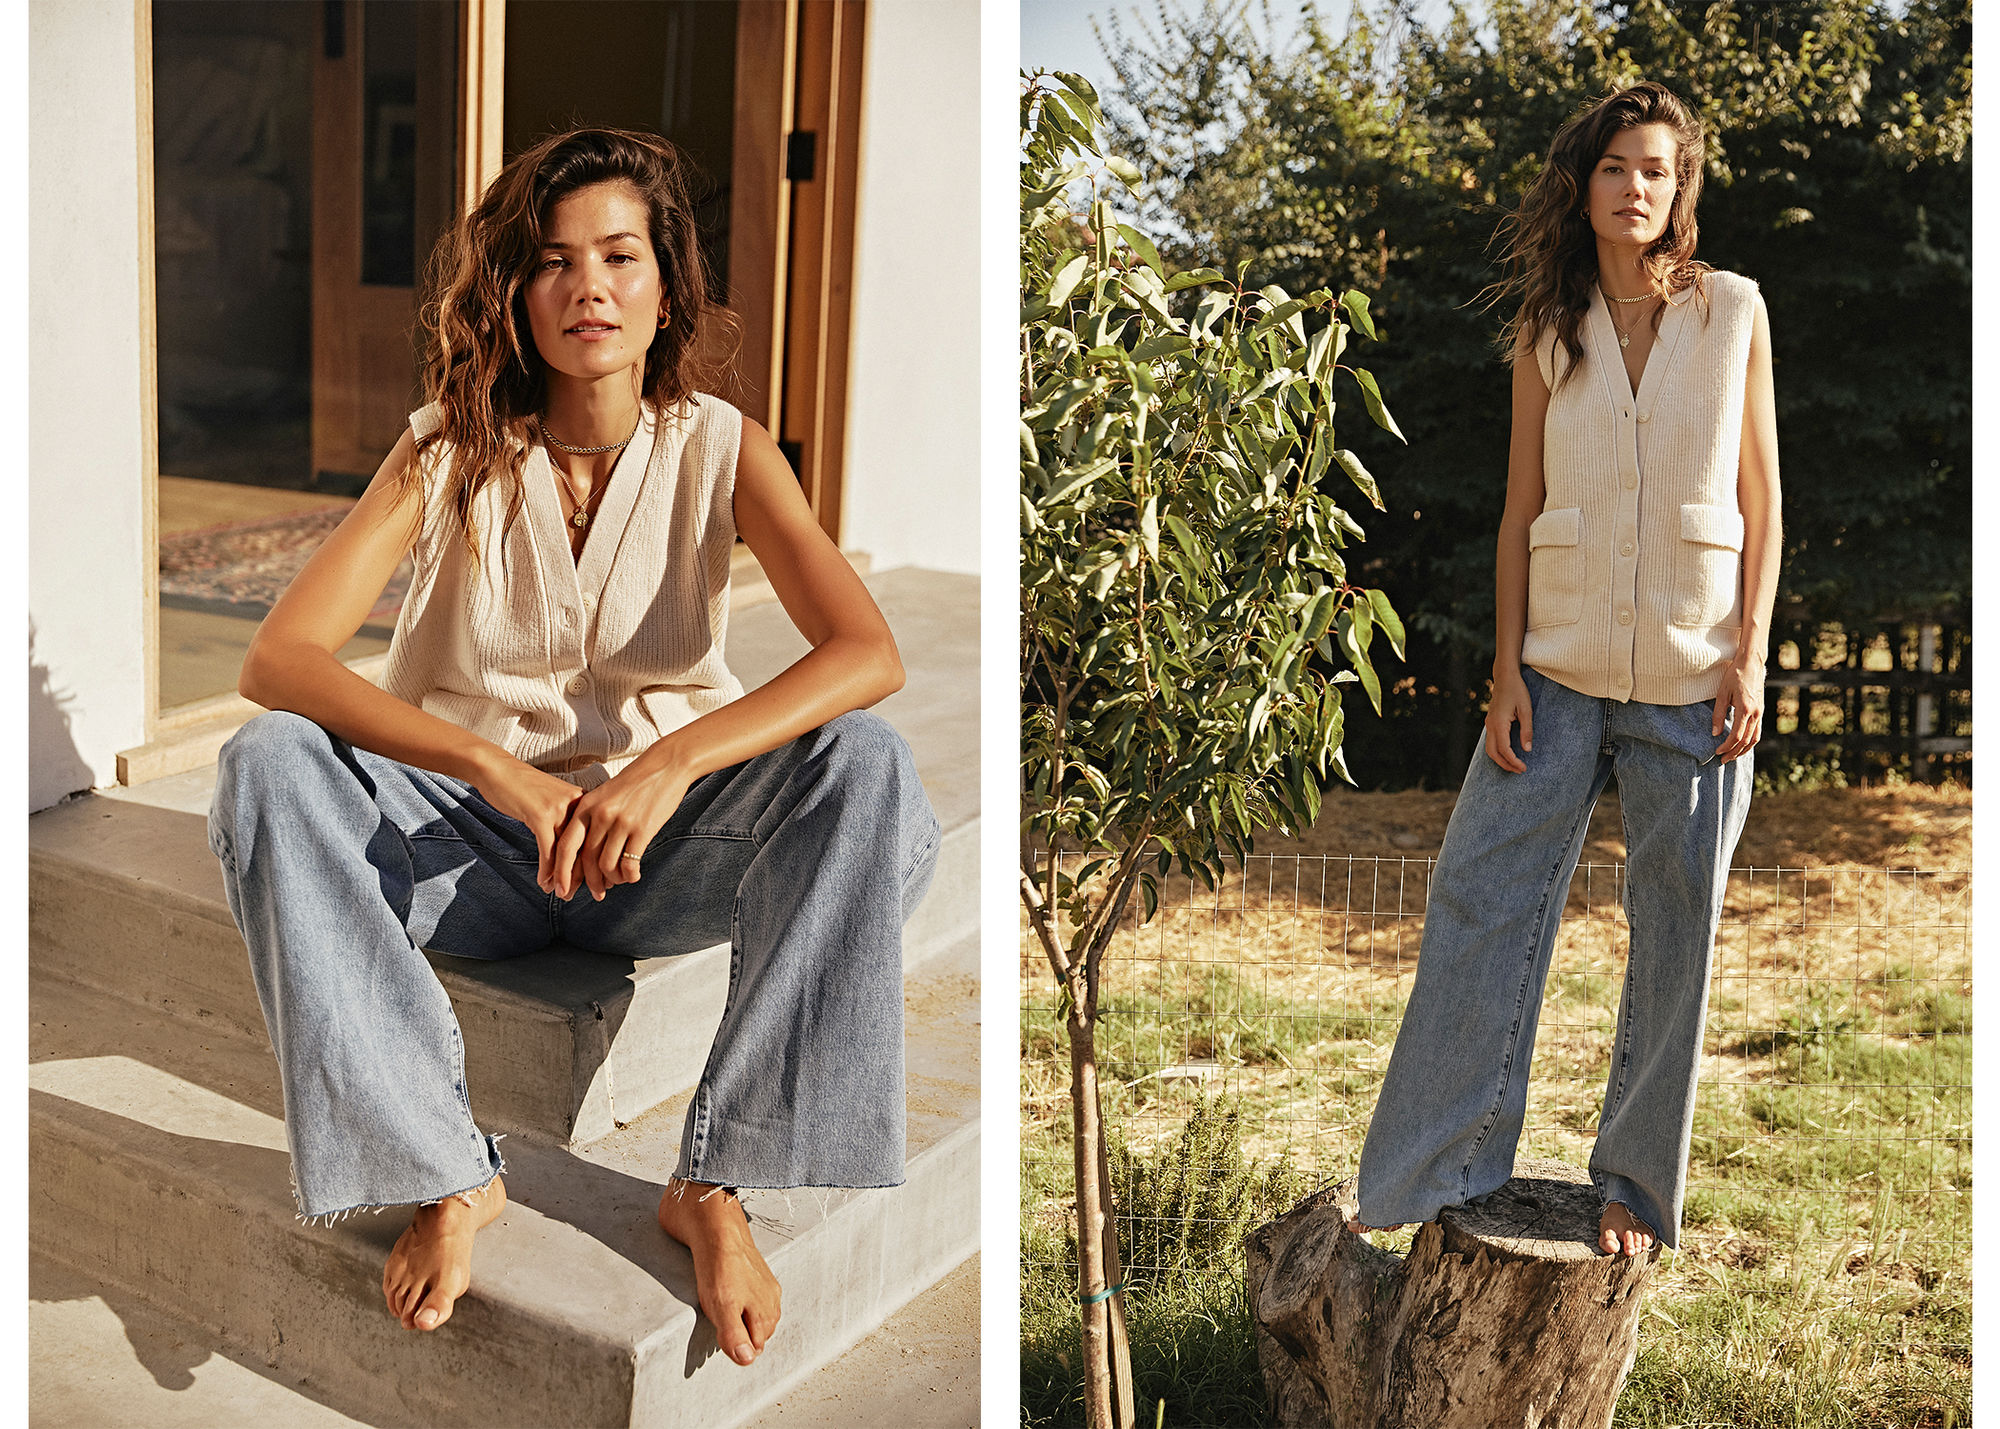 ALYSSA PIZER MANAGEMENT: Sheila Marquez By Kate Moore